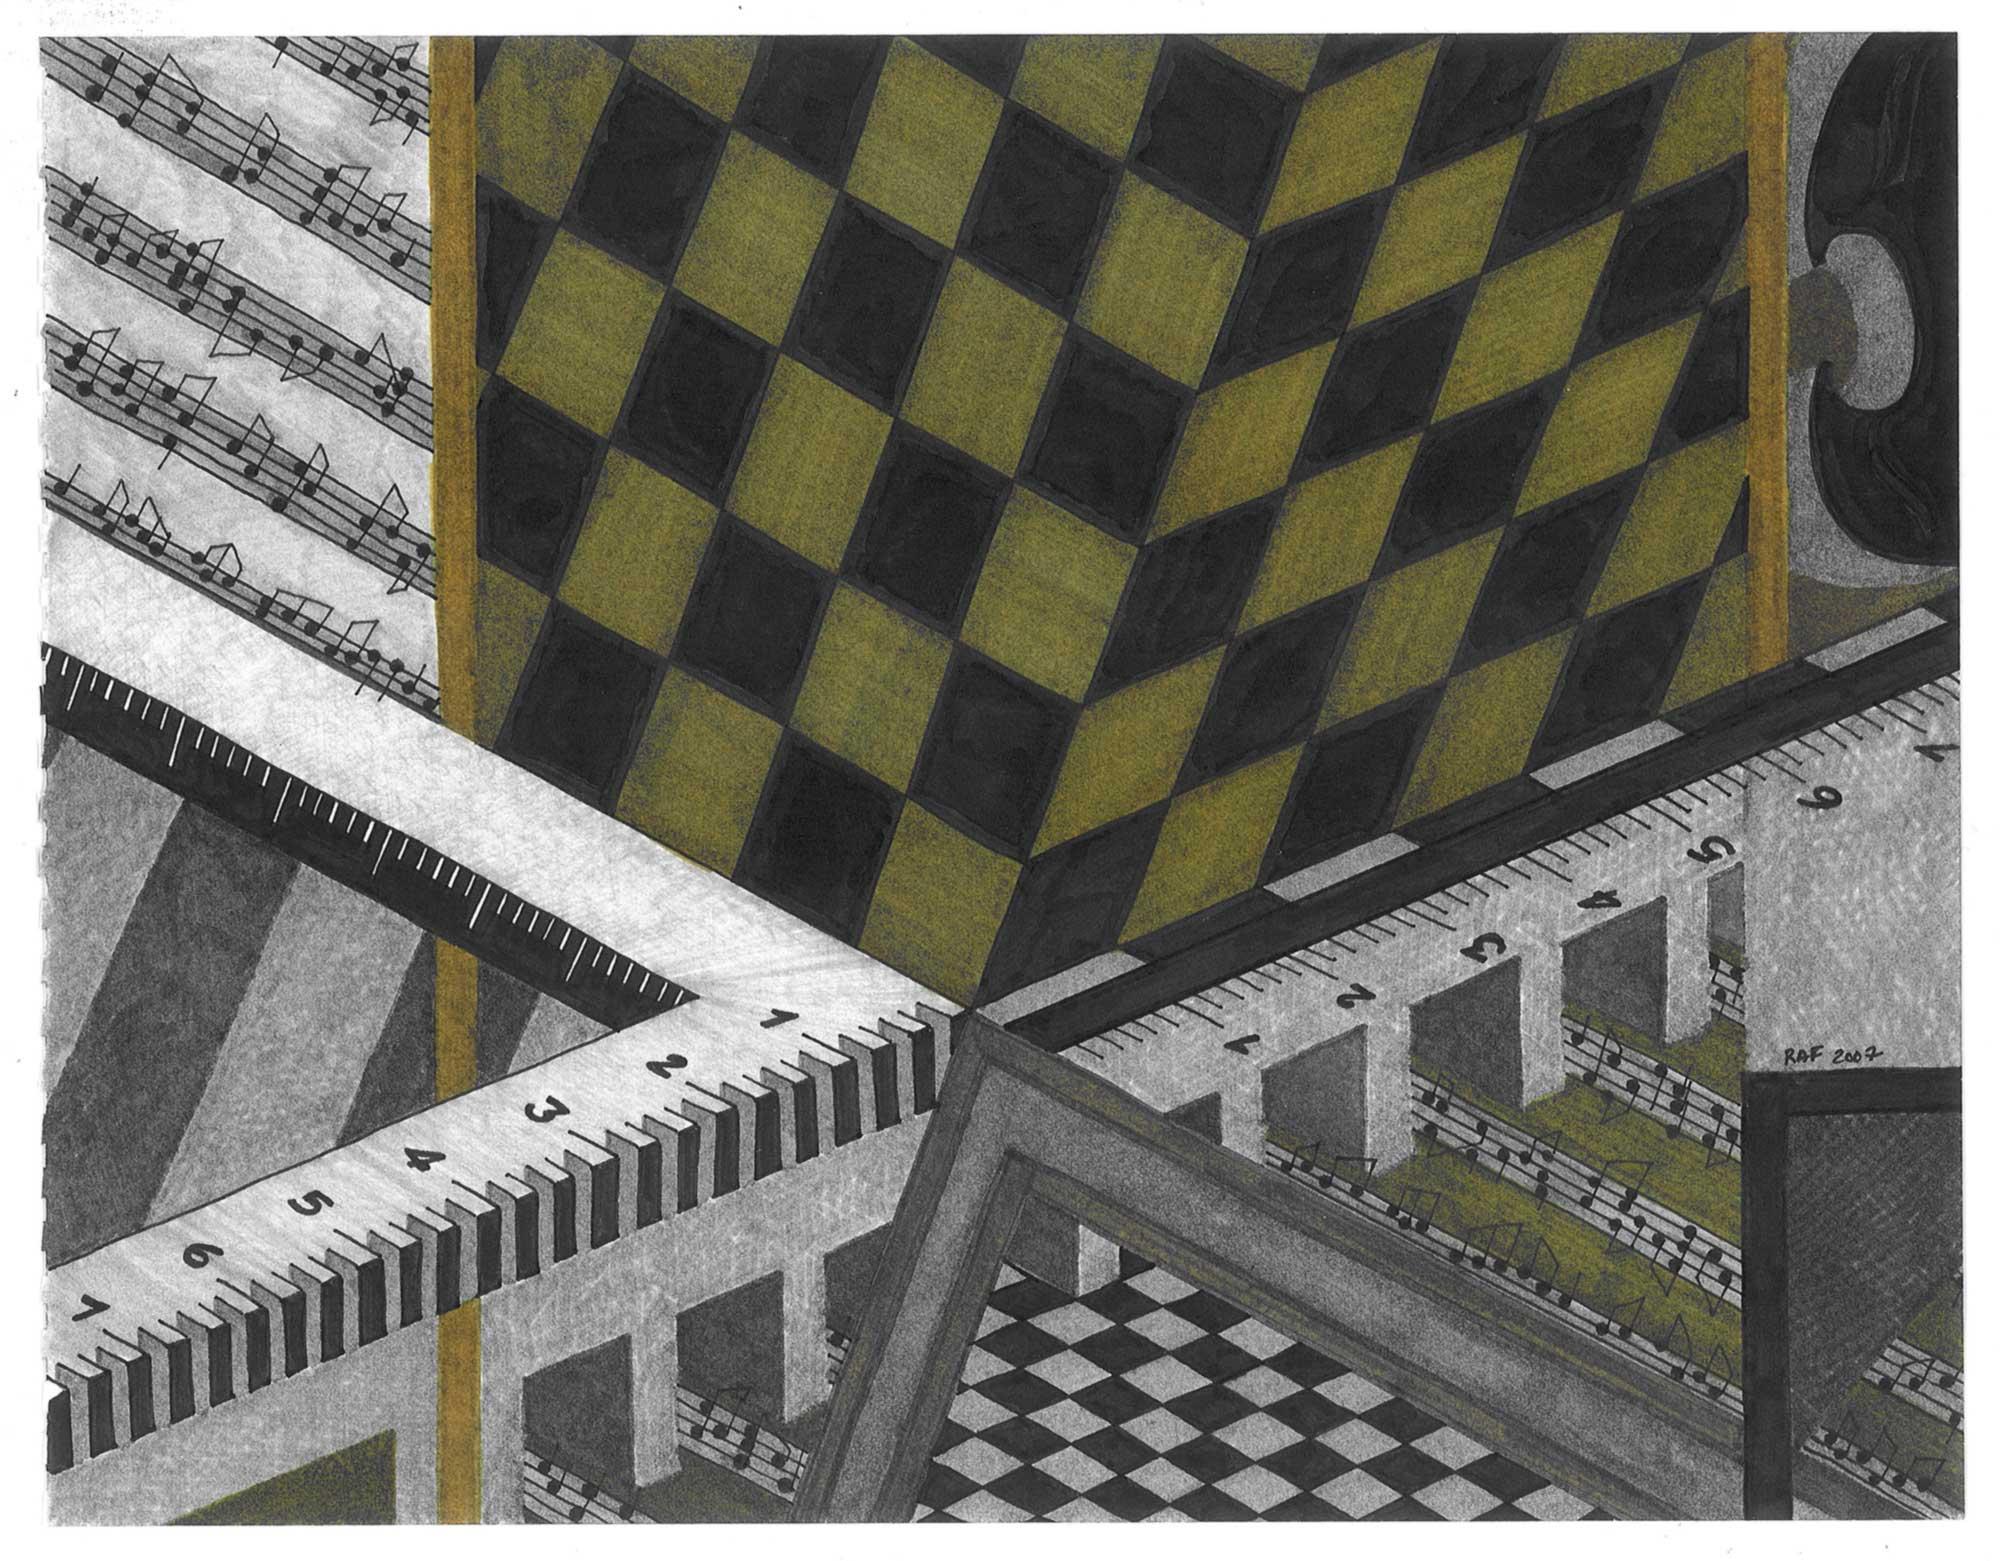 Chemin de fer, dessin, Raf Listowski, 2007